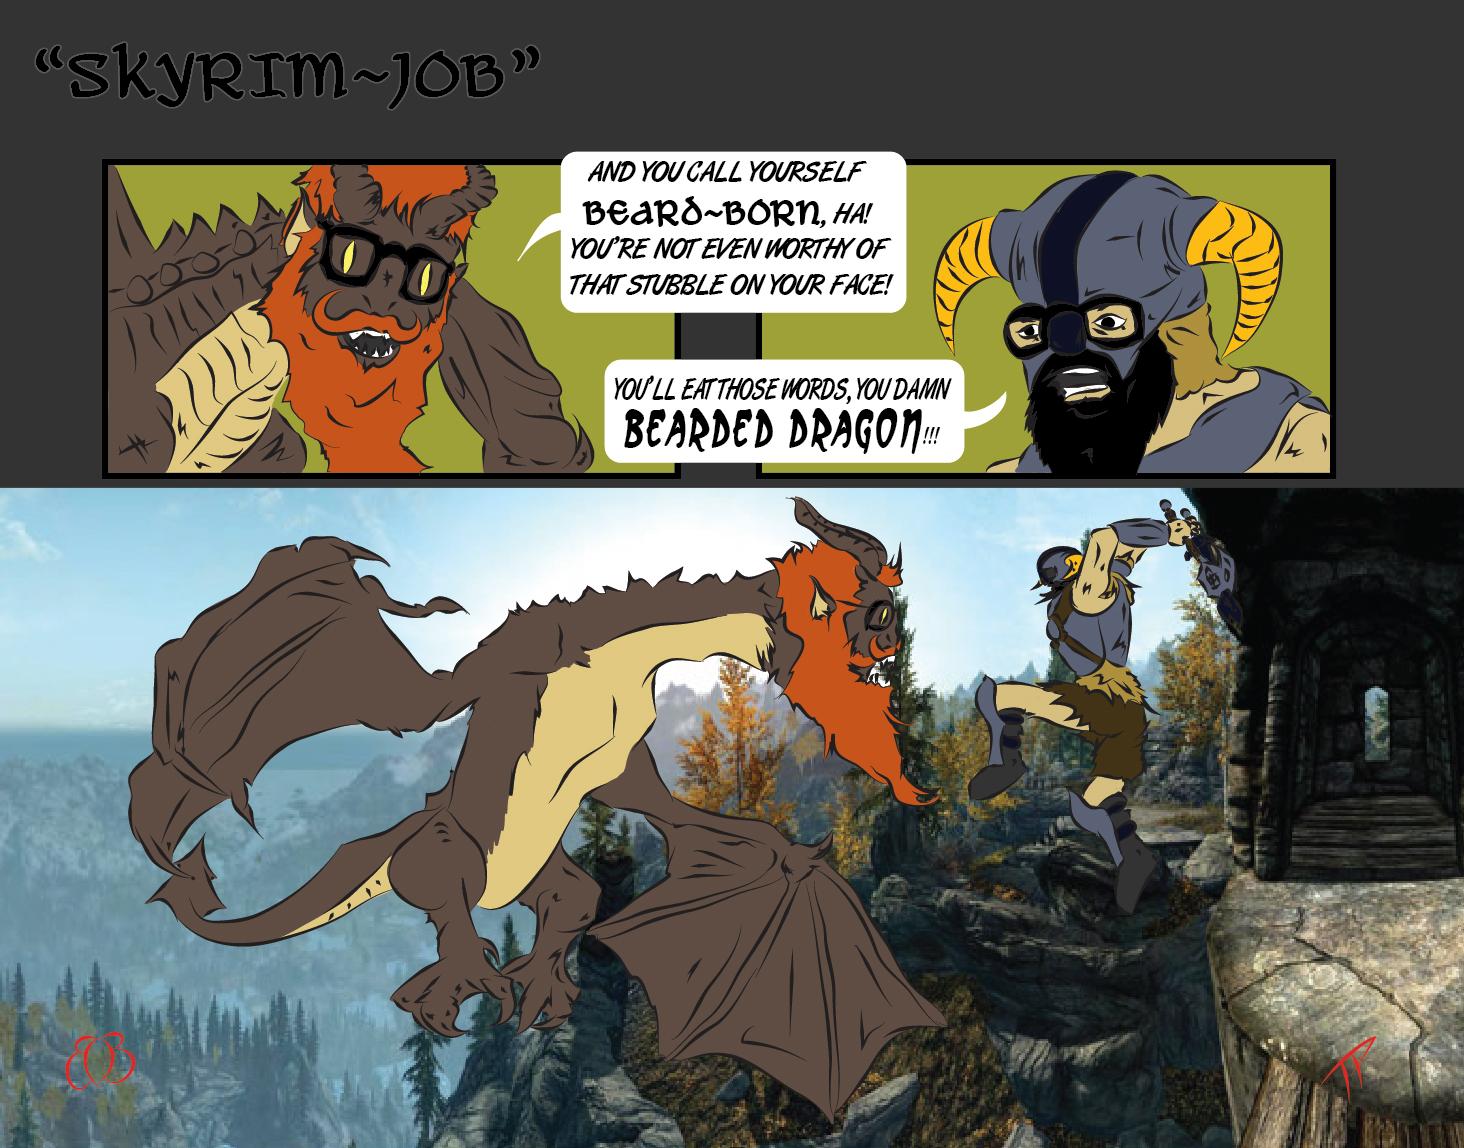 Skyrim-job